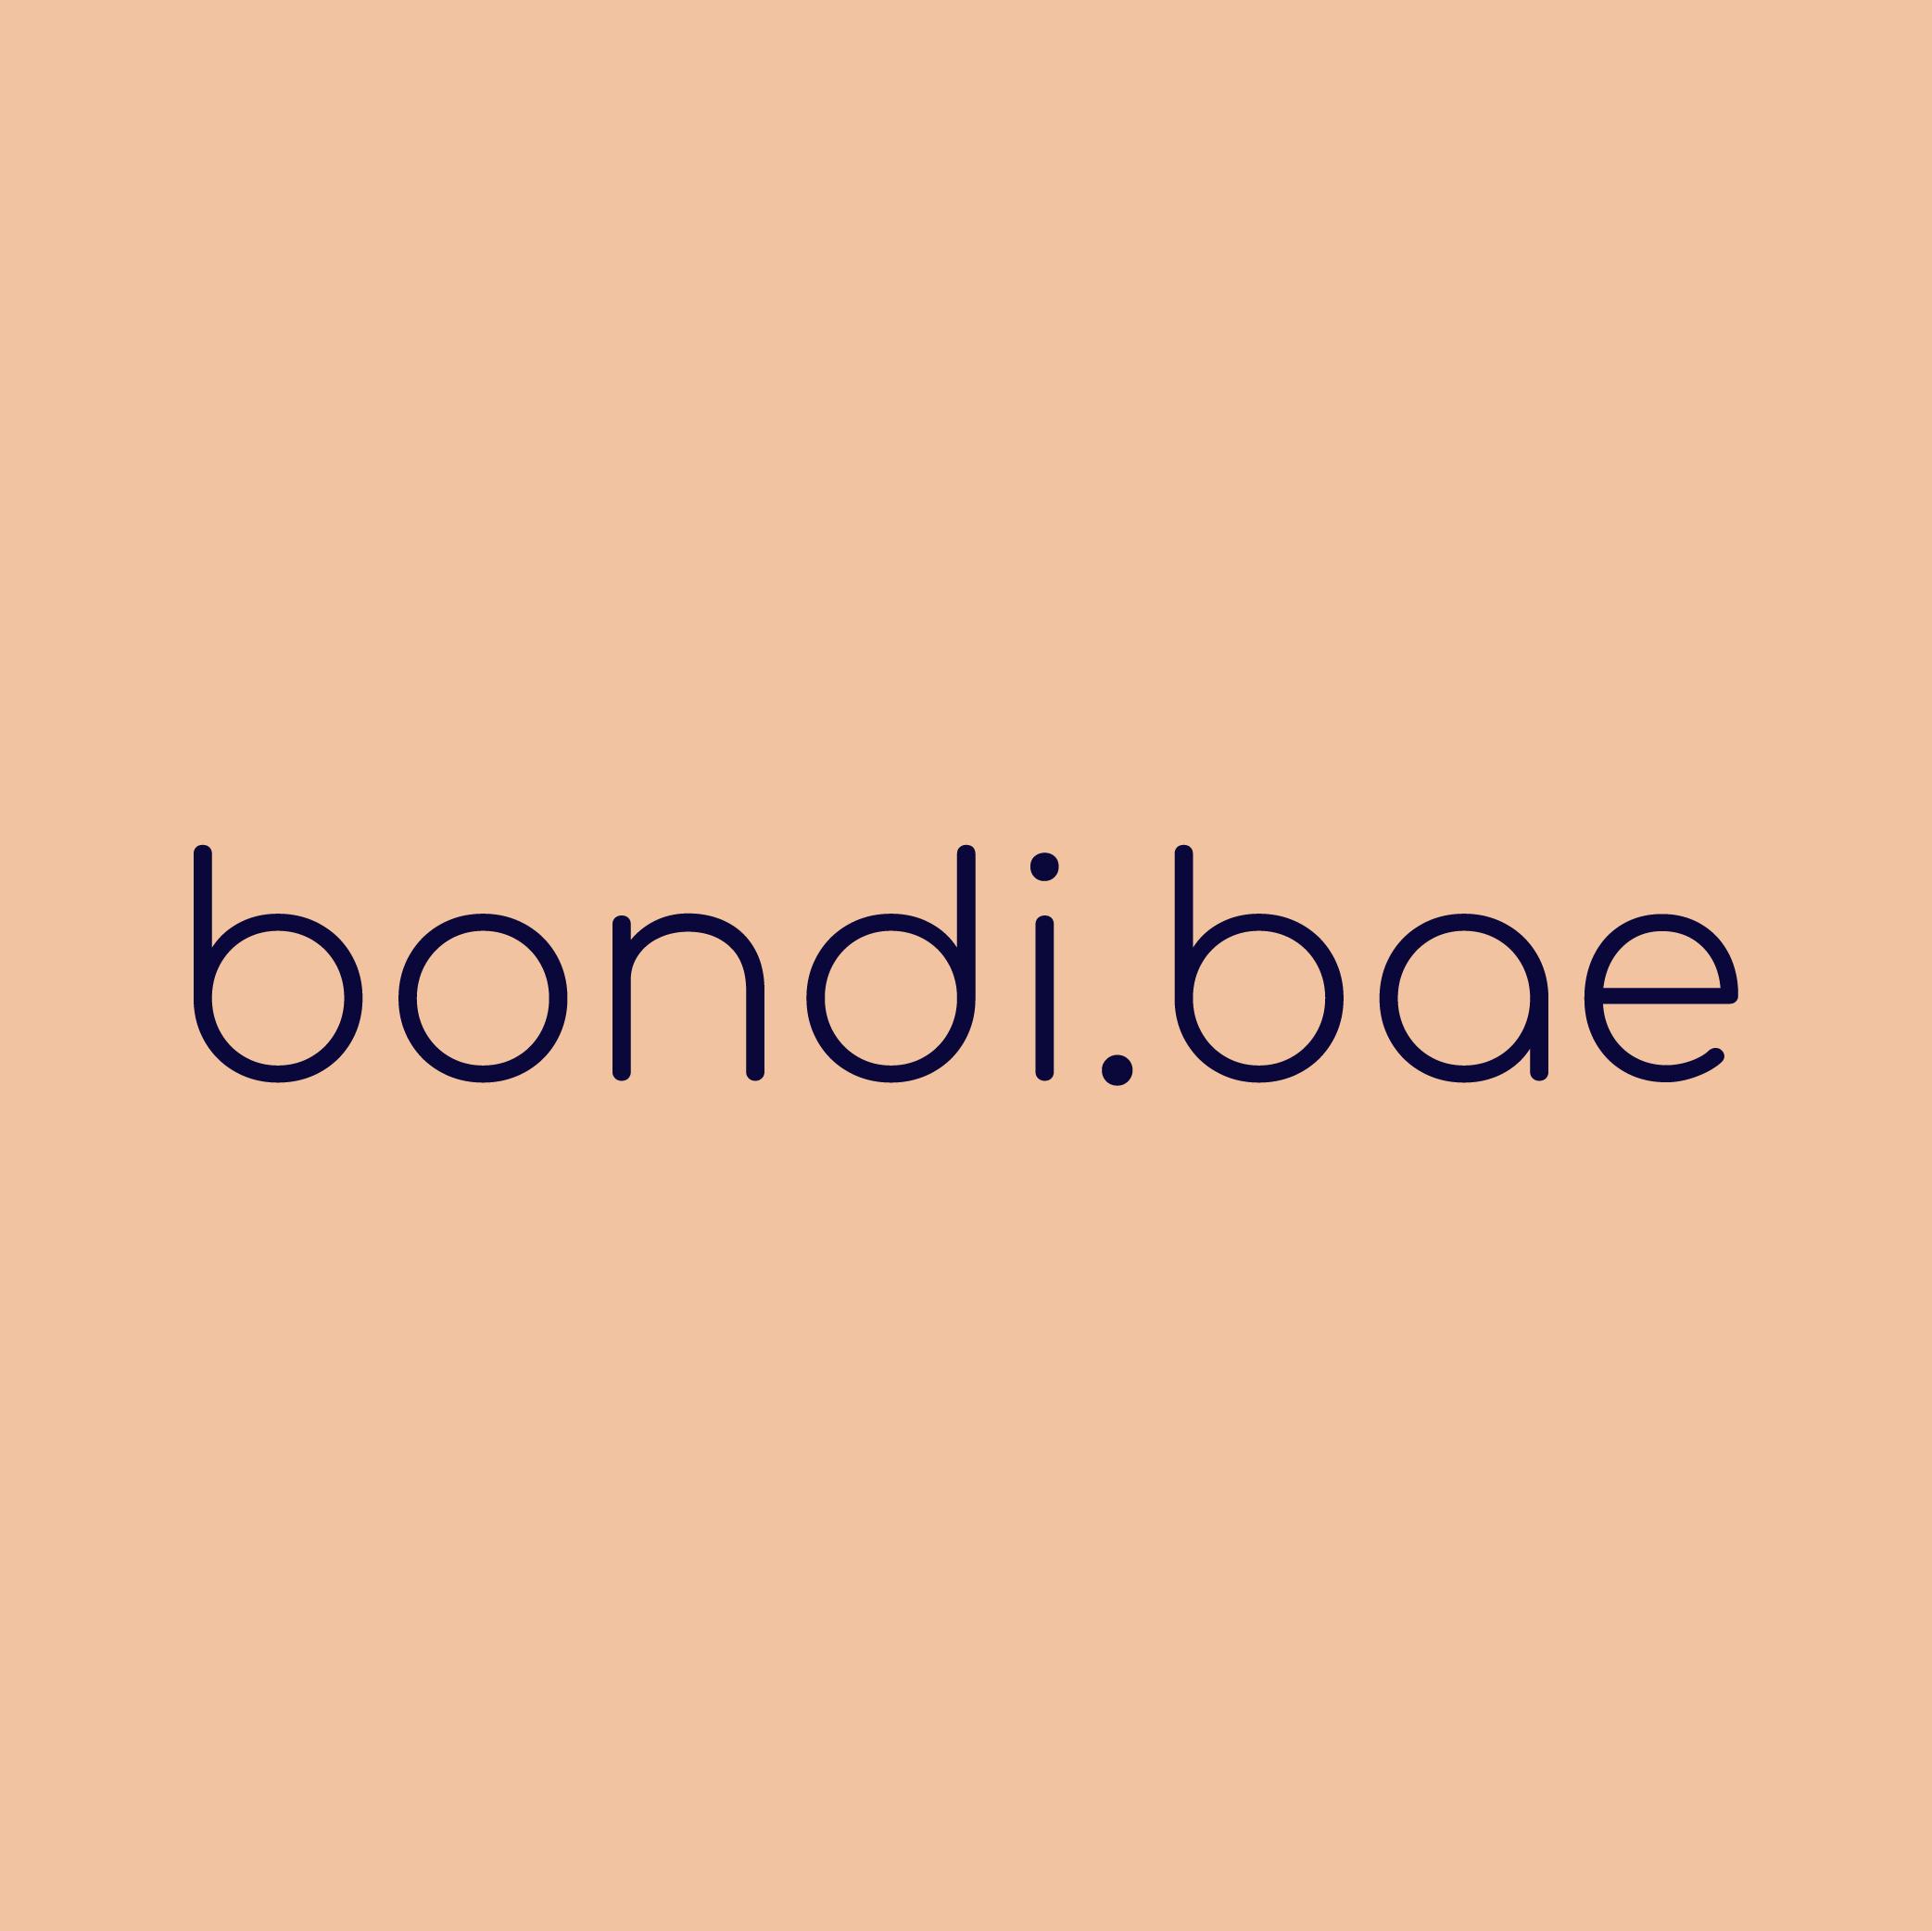 bondi.bae_navy_light.jpg